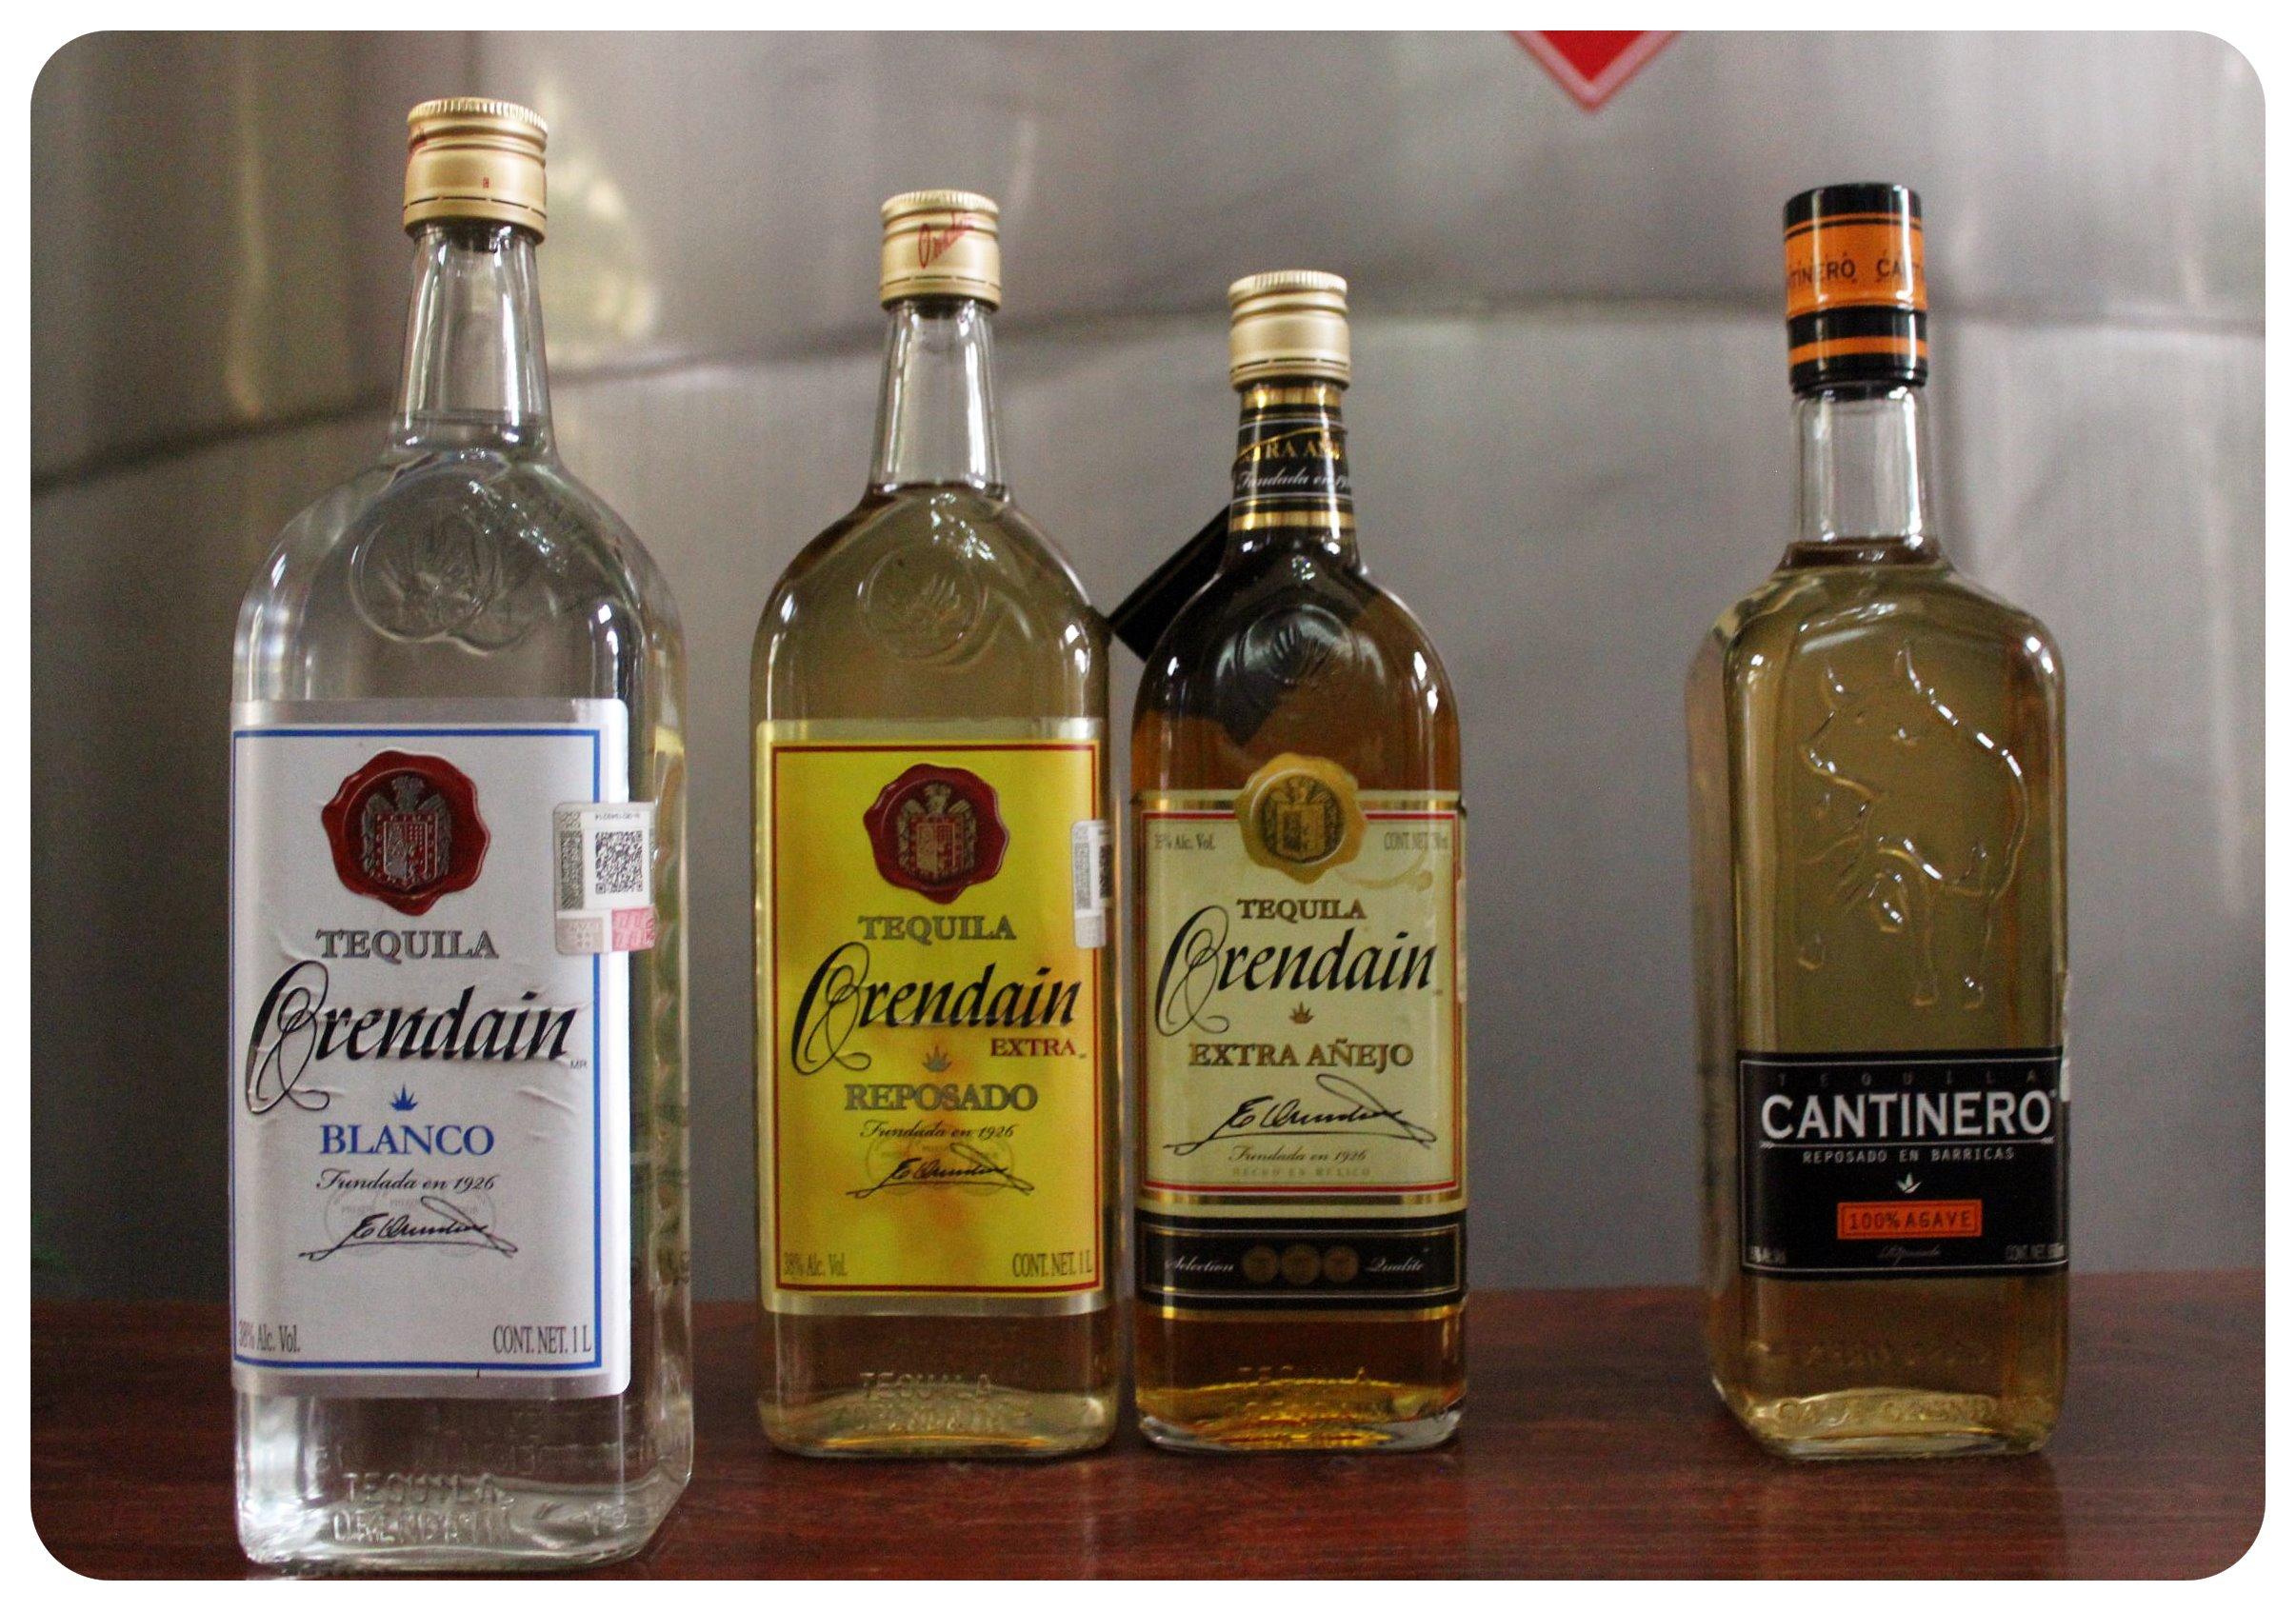 tequila orendain tequilas